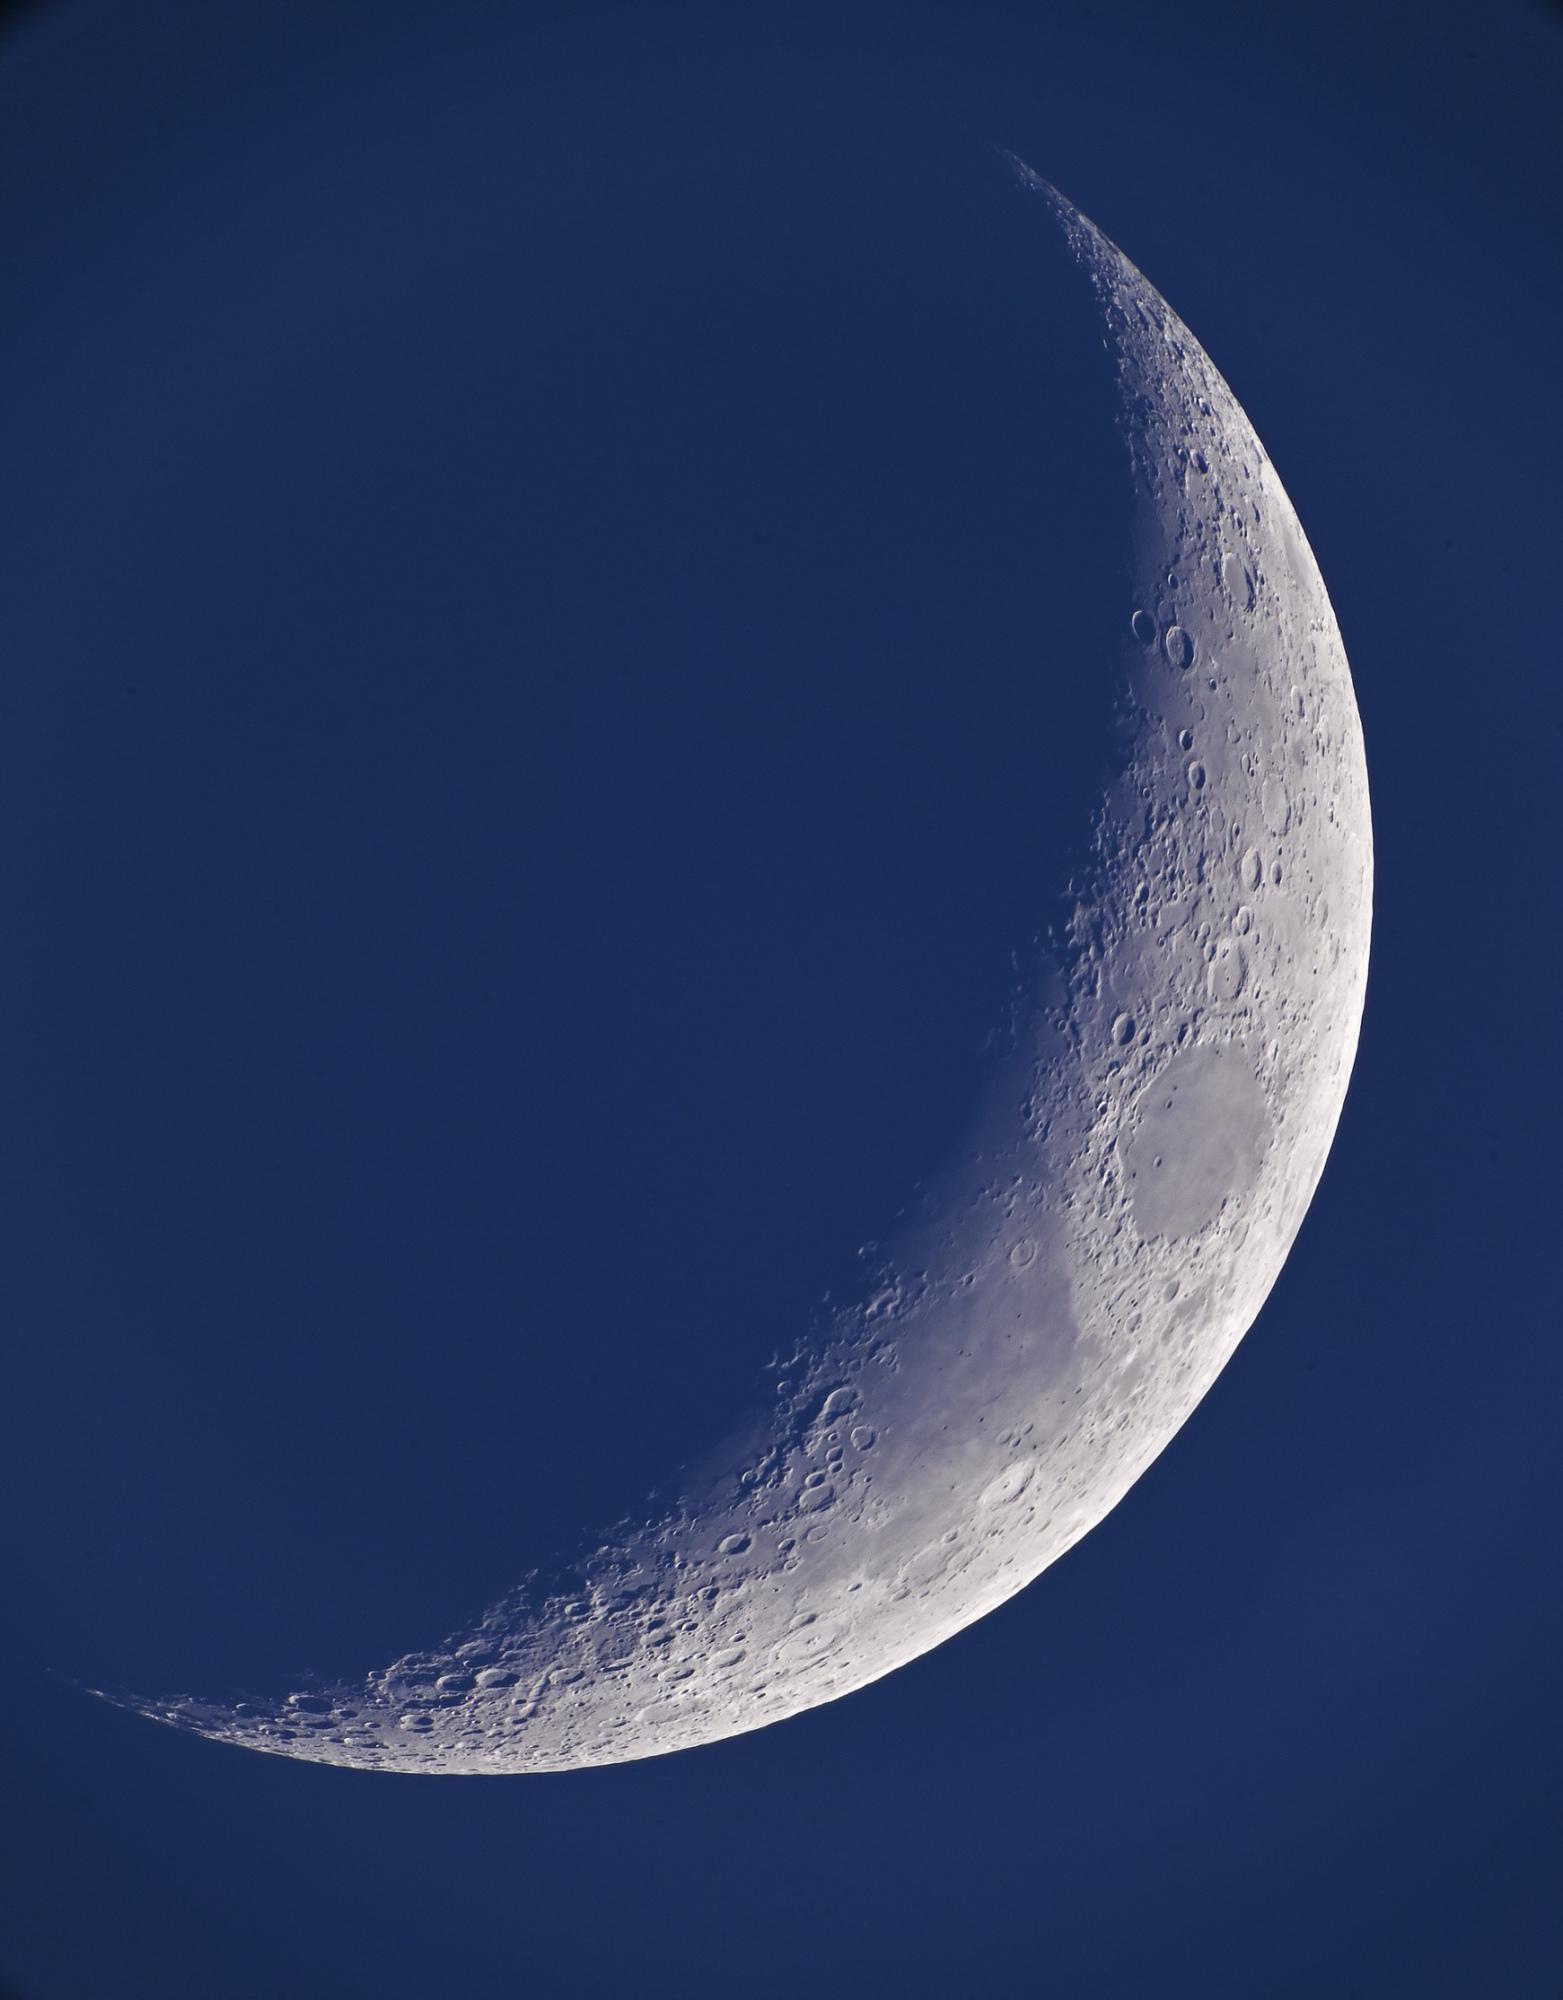 5e31eba04de2e_lune29jan19.thumb.jpg.640d60302c2c288b6c476702c6764951.jpg